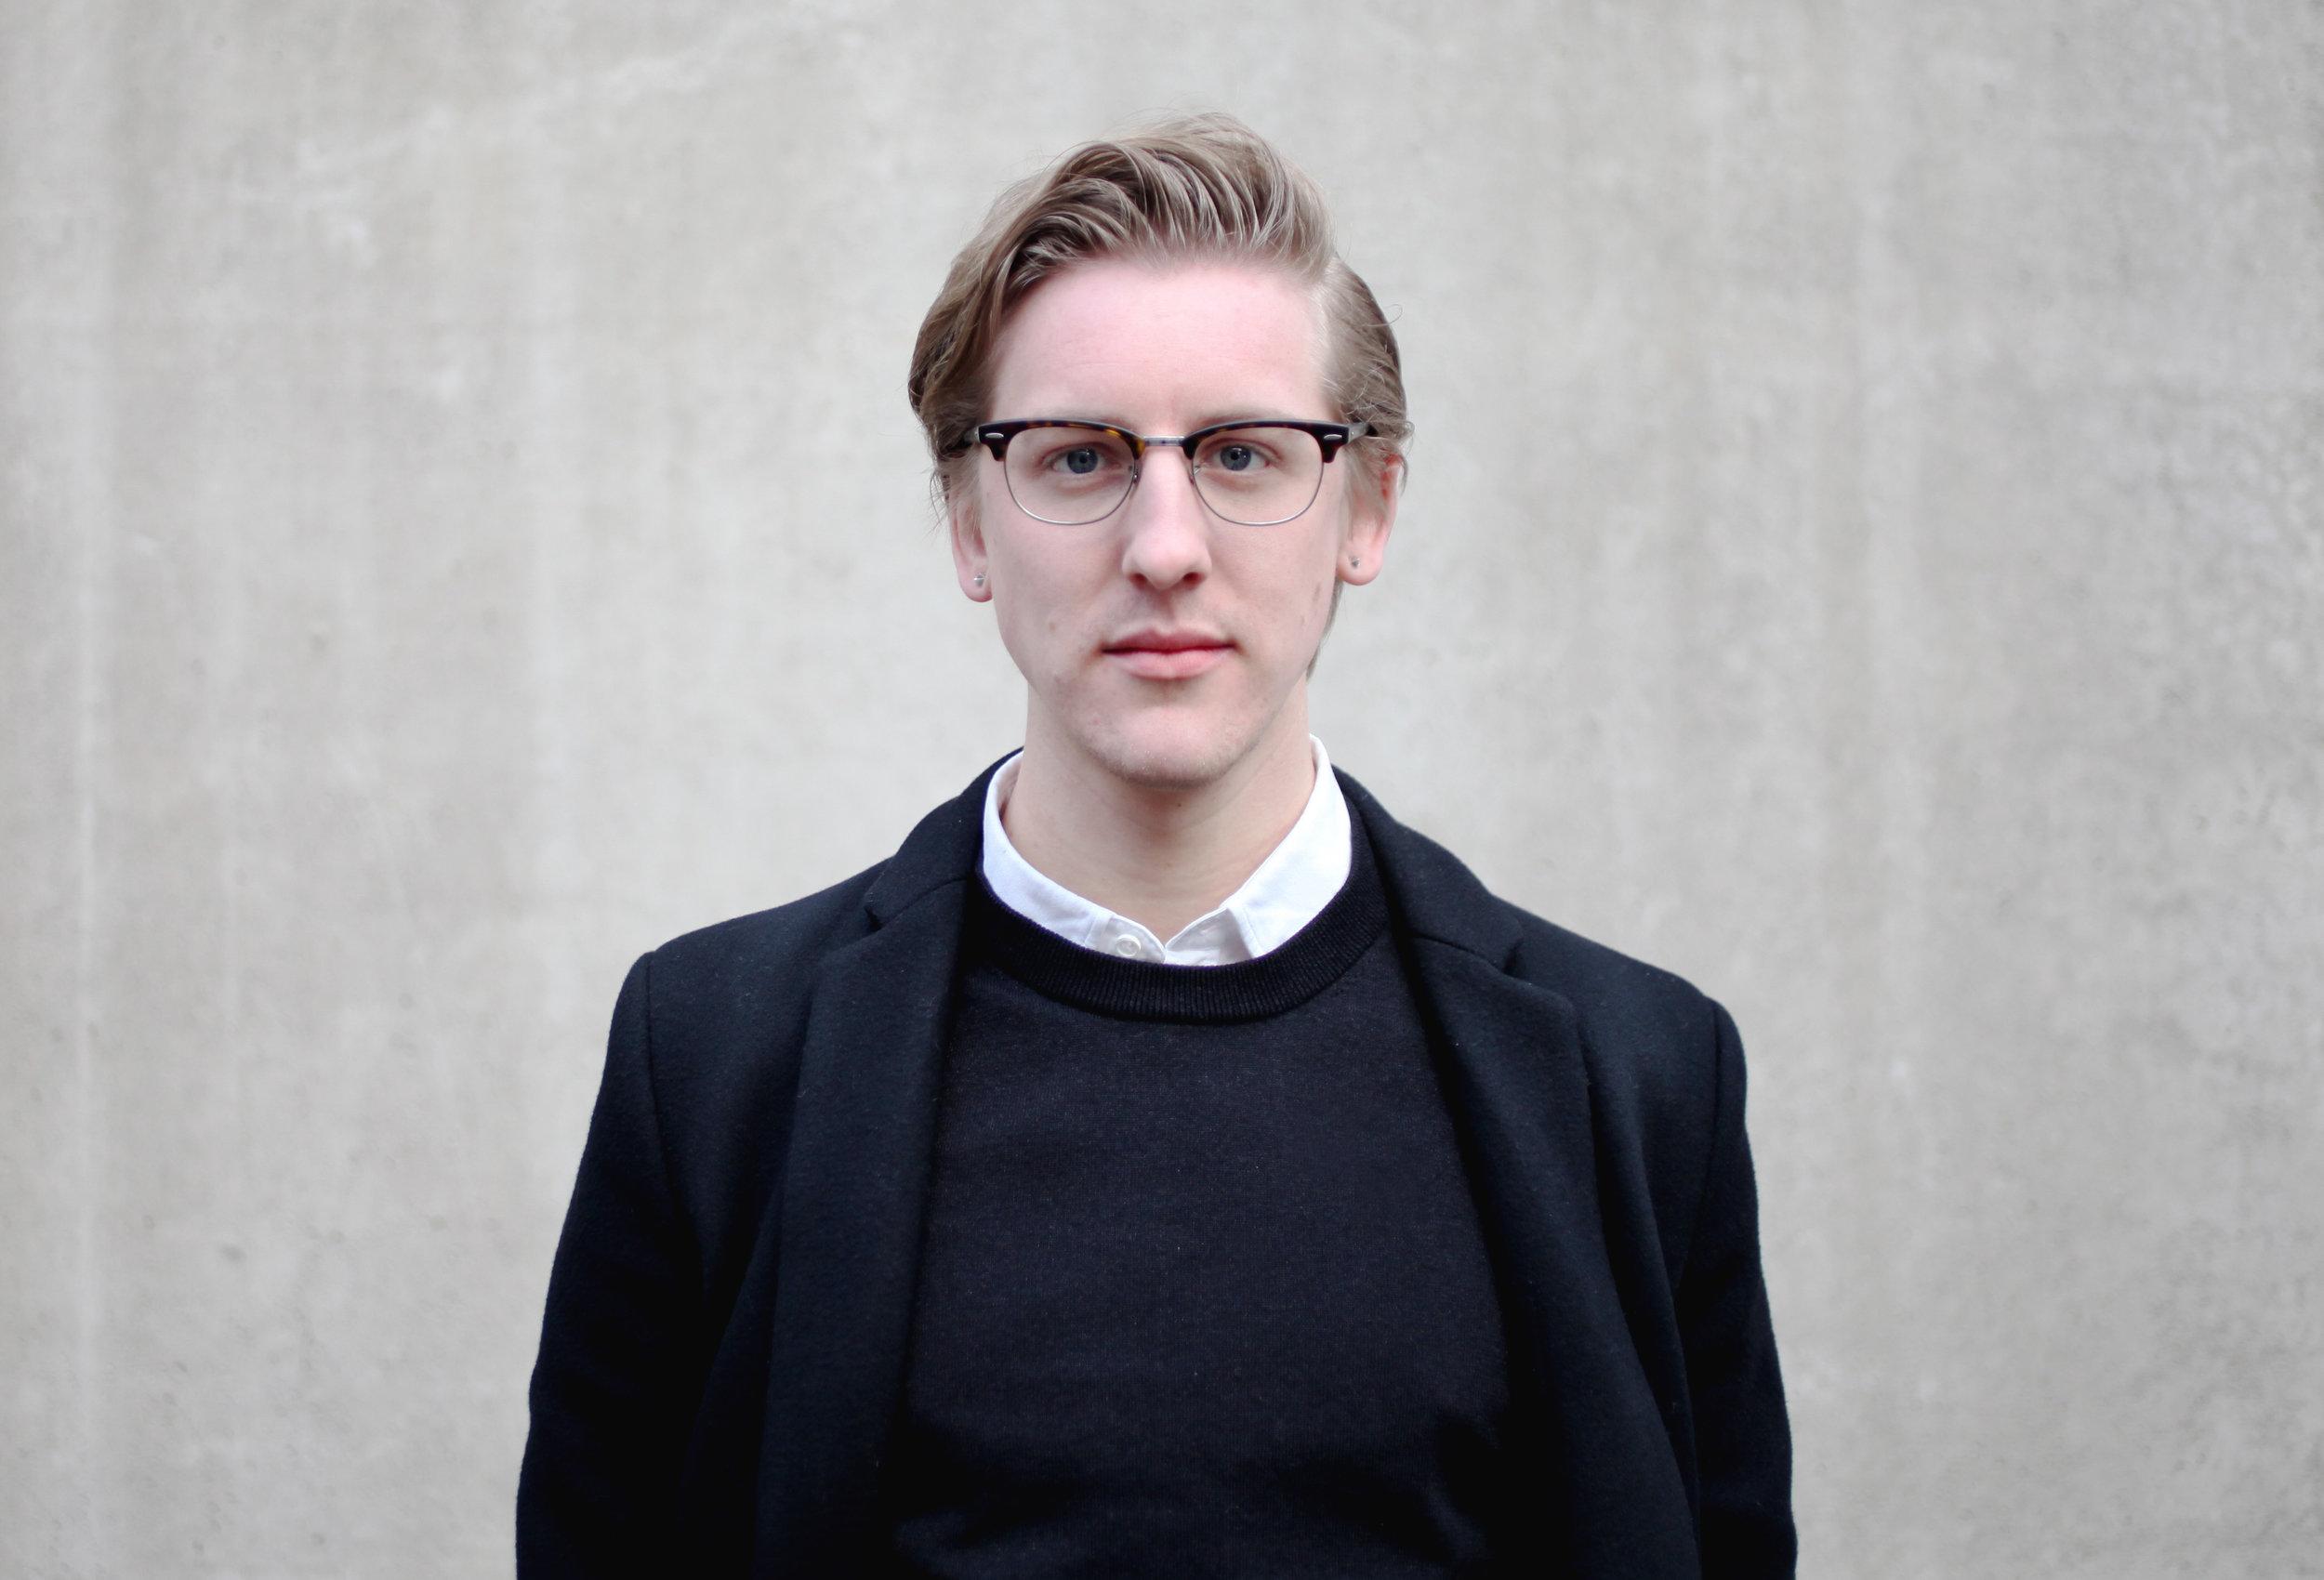 dawid_ullgren_director (2).jpg